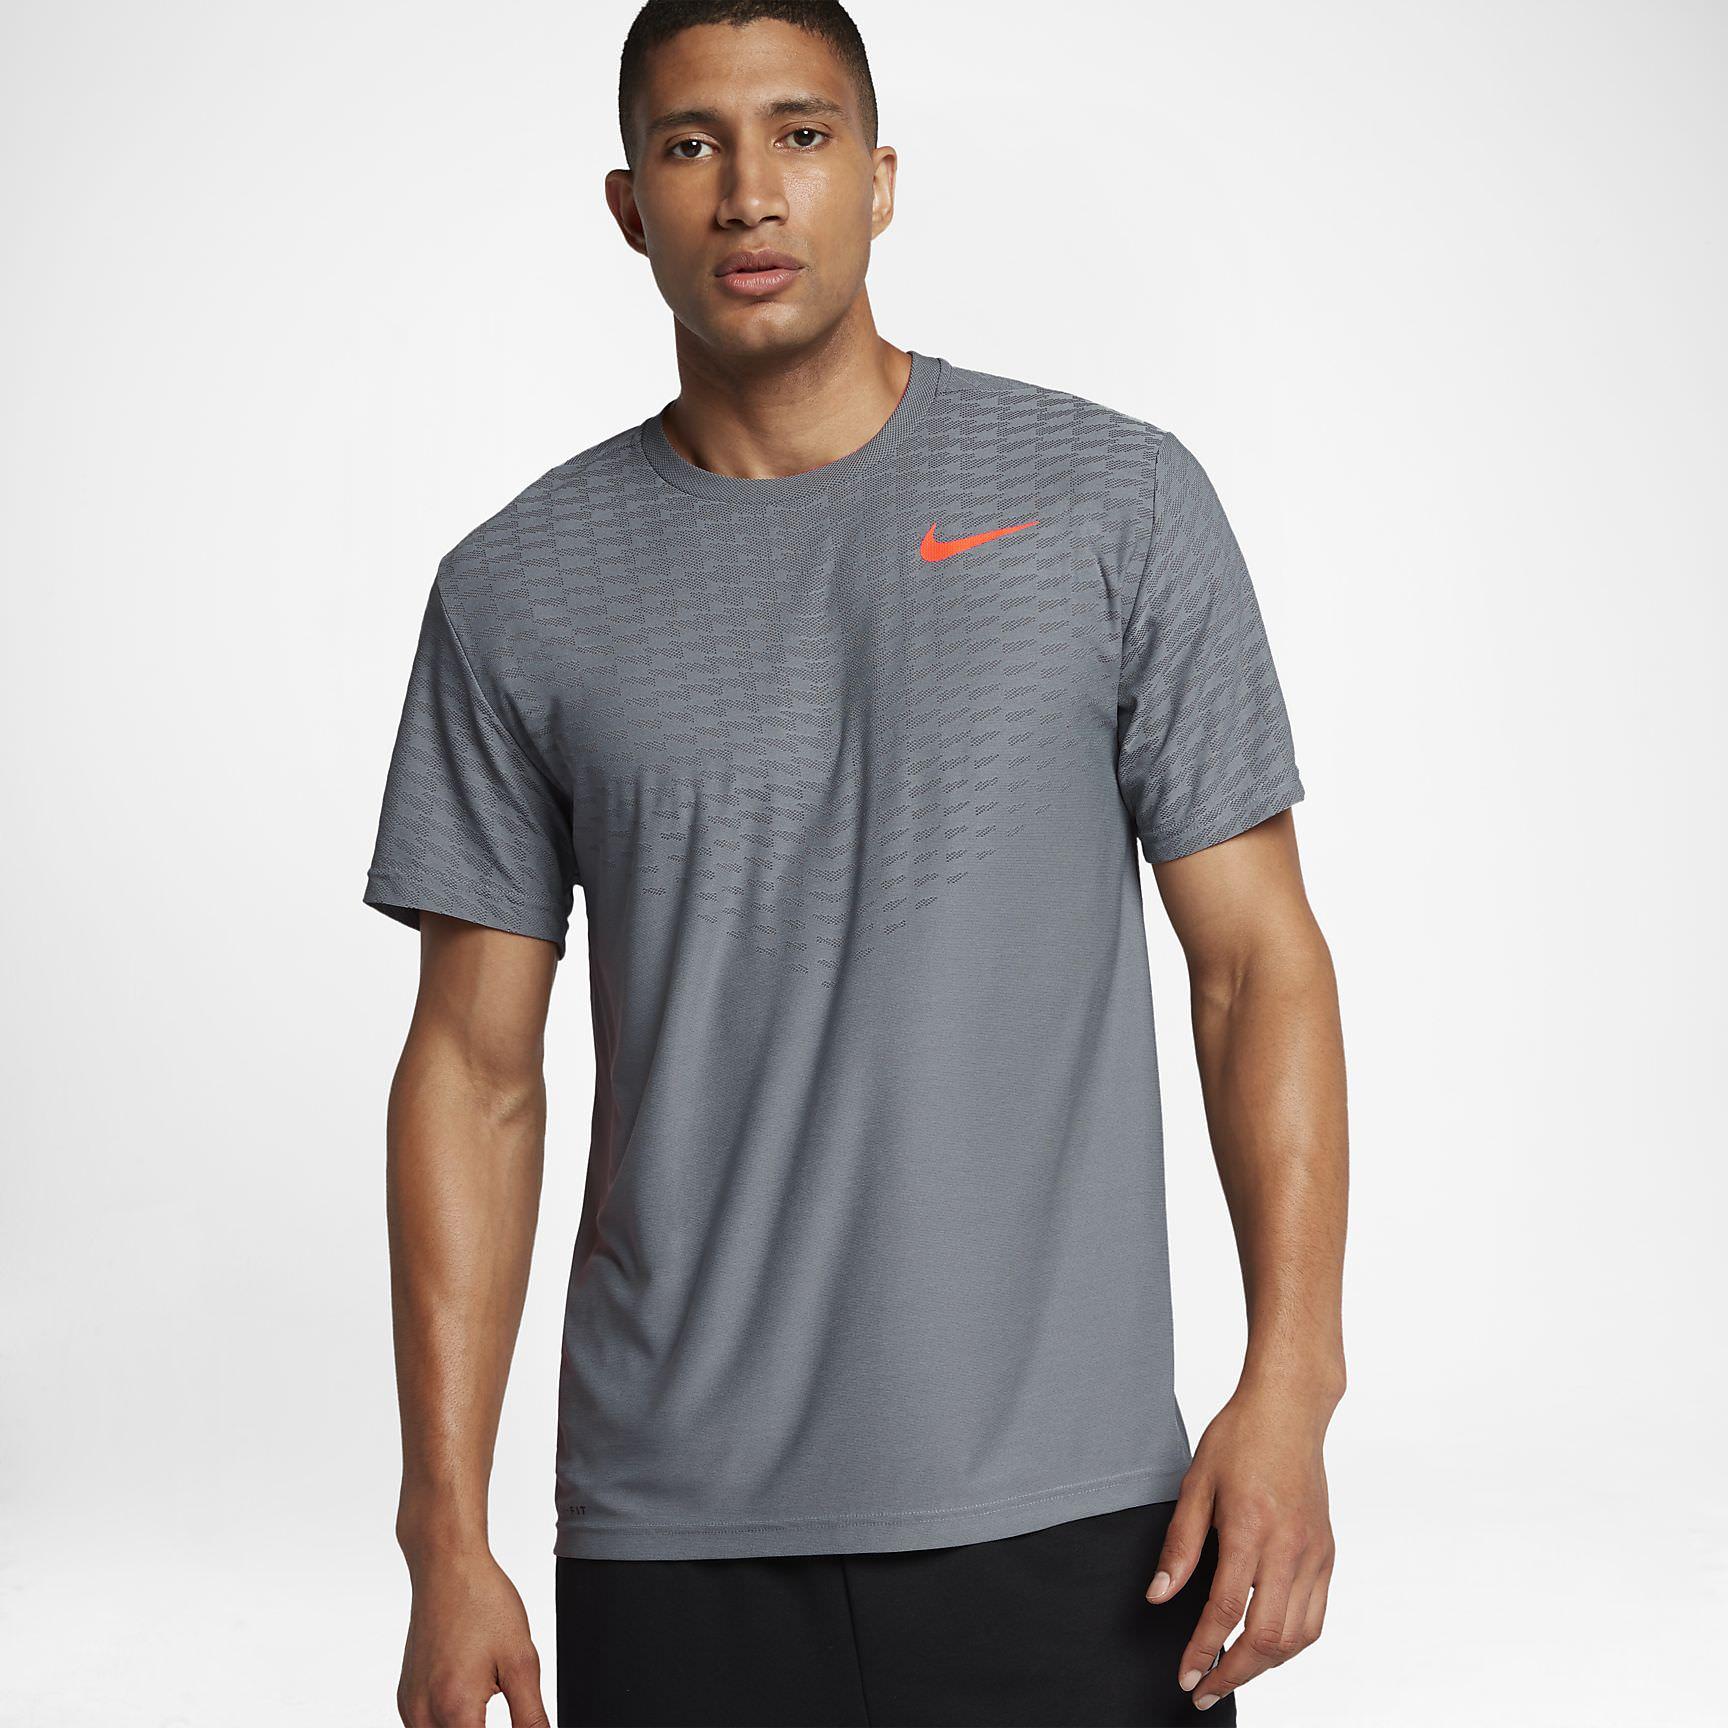 Nike Zonal Cooling Training Top